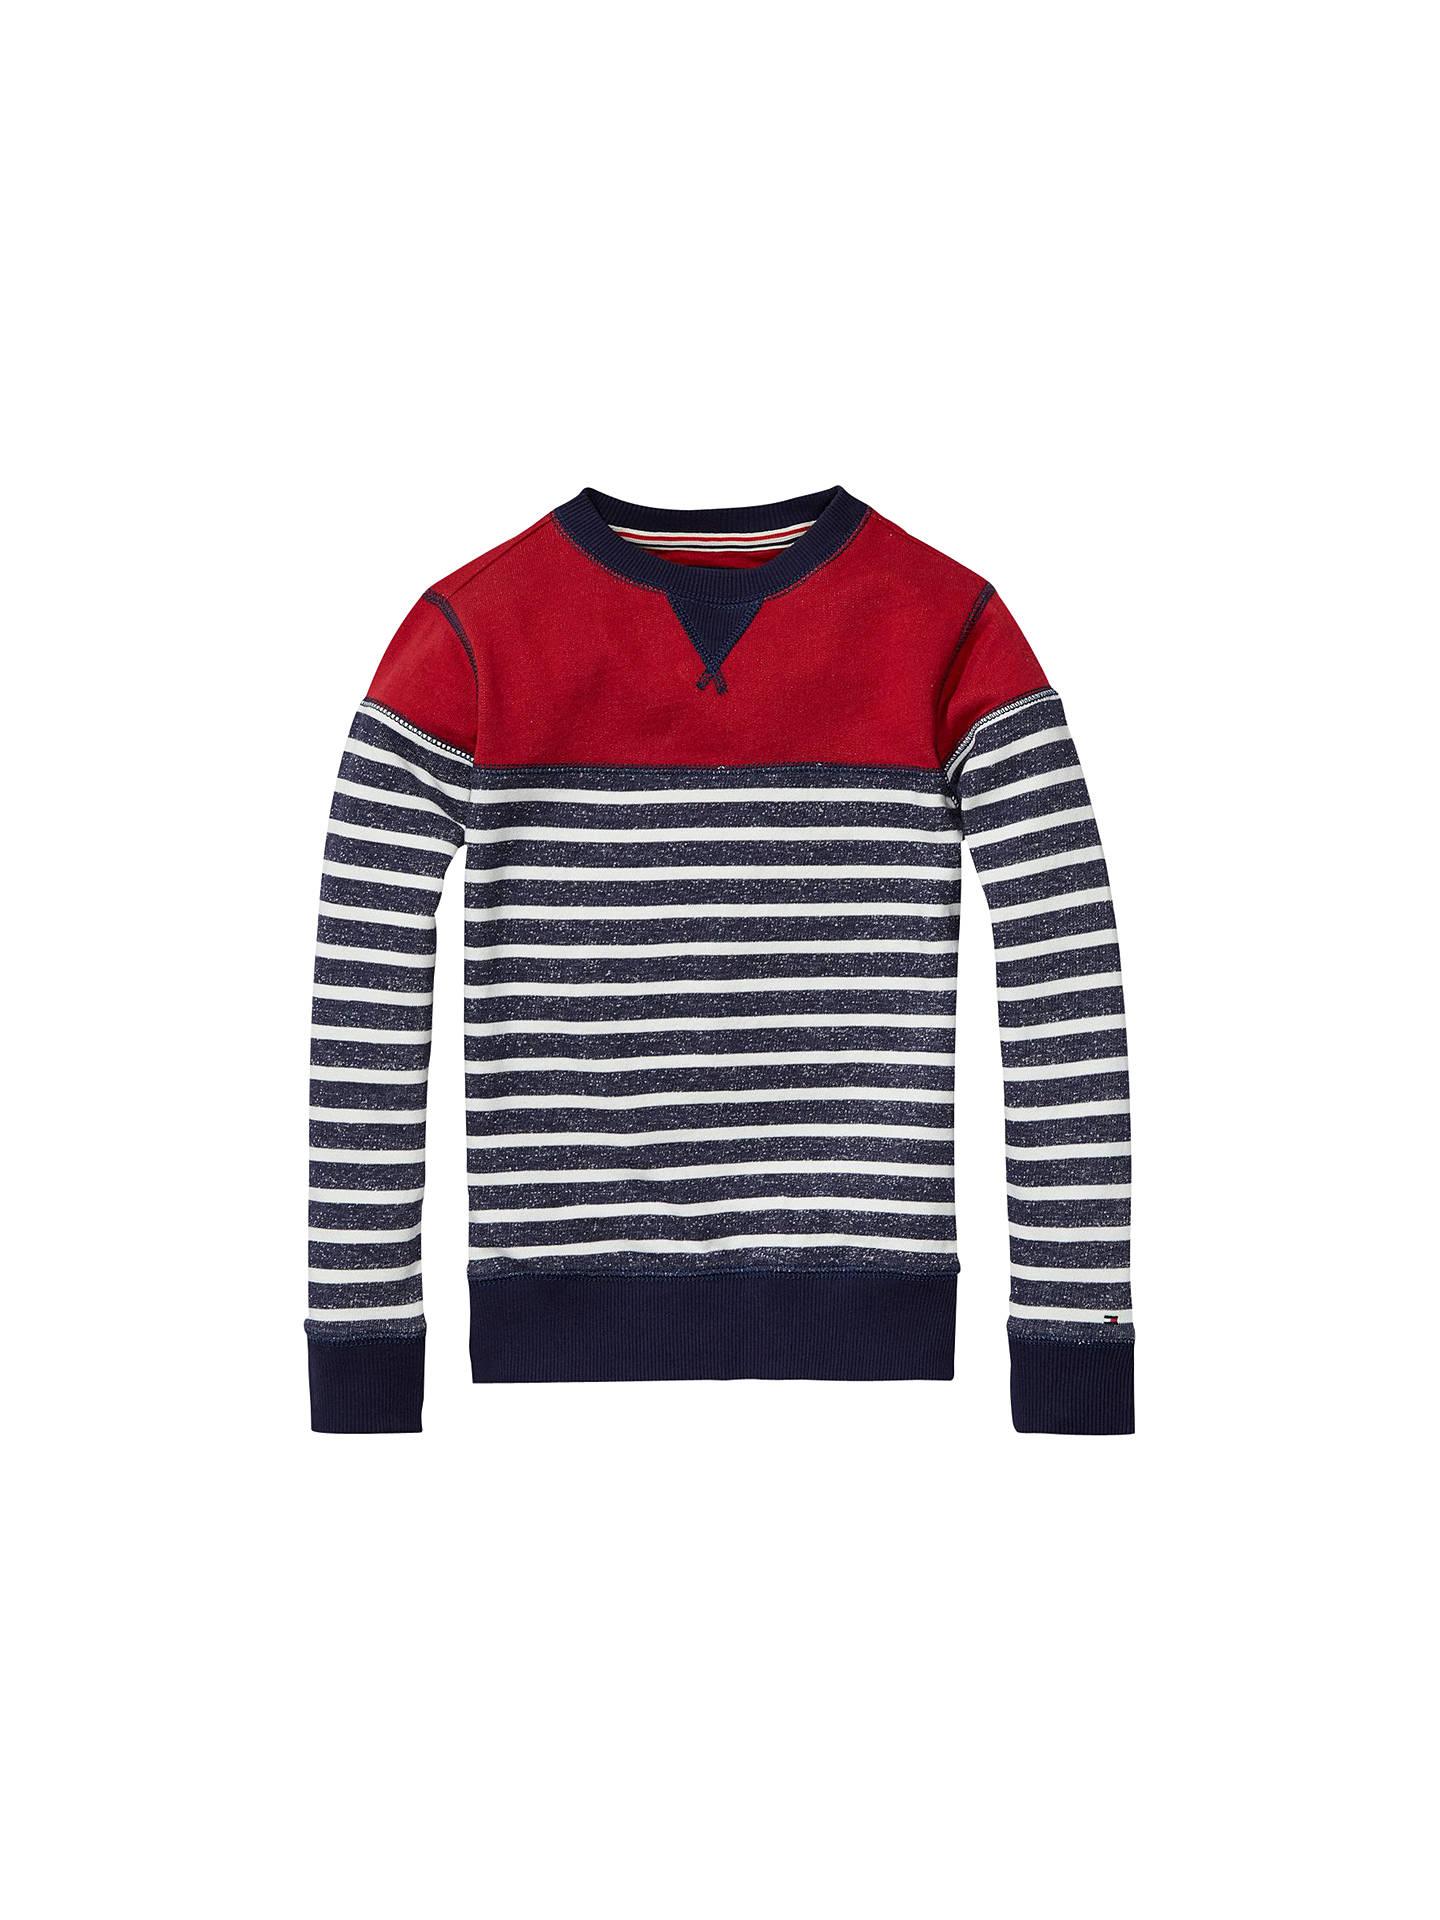 ac23495f Buy Tommy Hilfiger Boys' Stripe Knit Jumper, Black Iris, 2 years Online at  ...